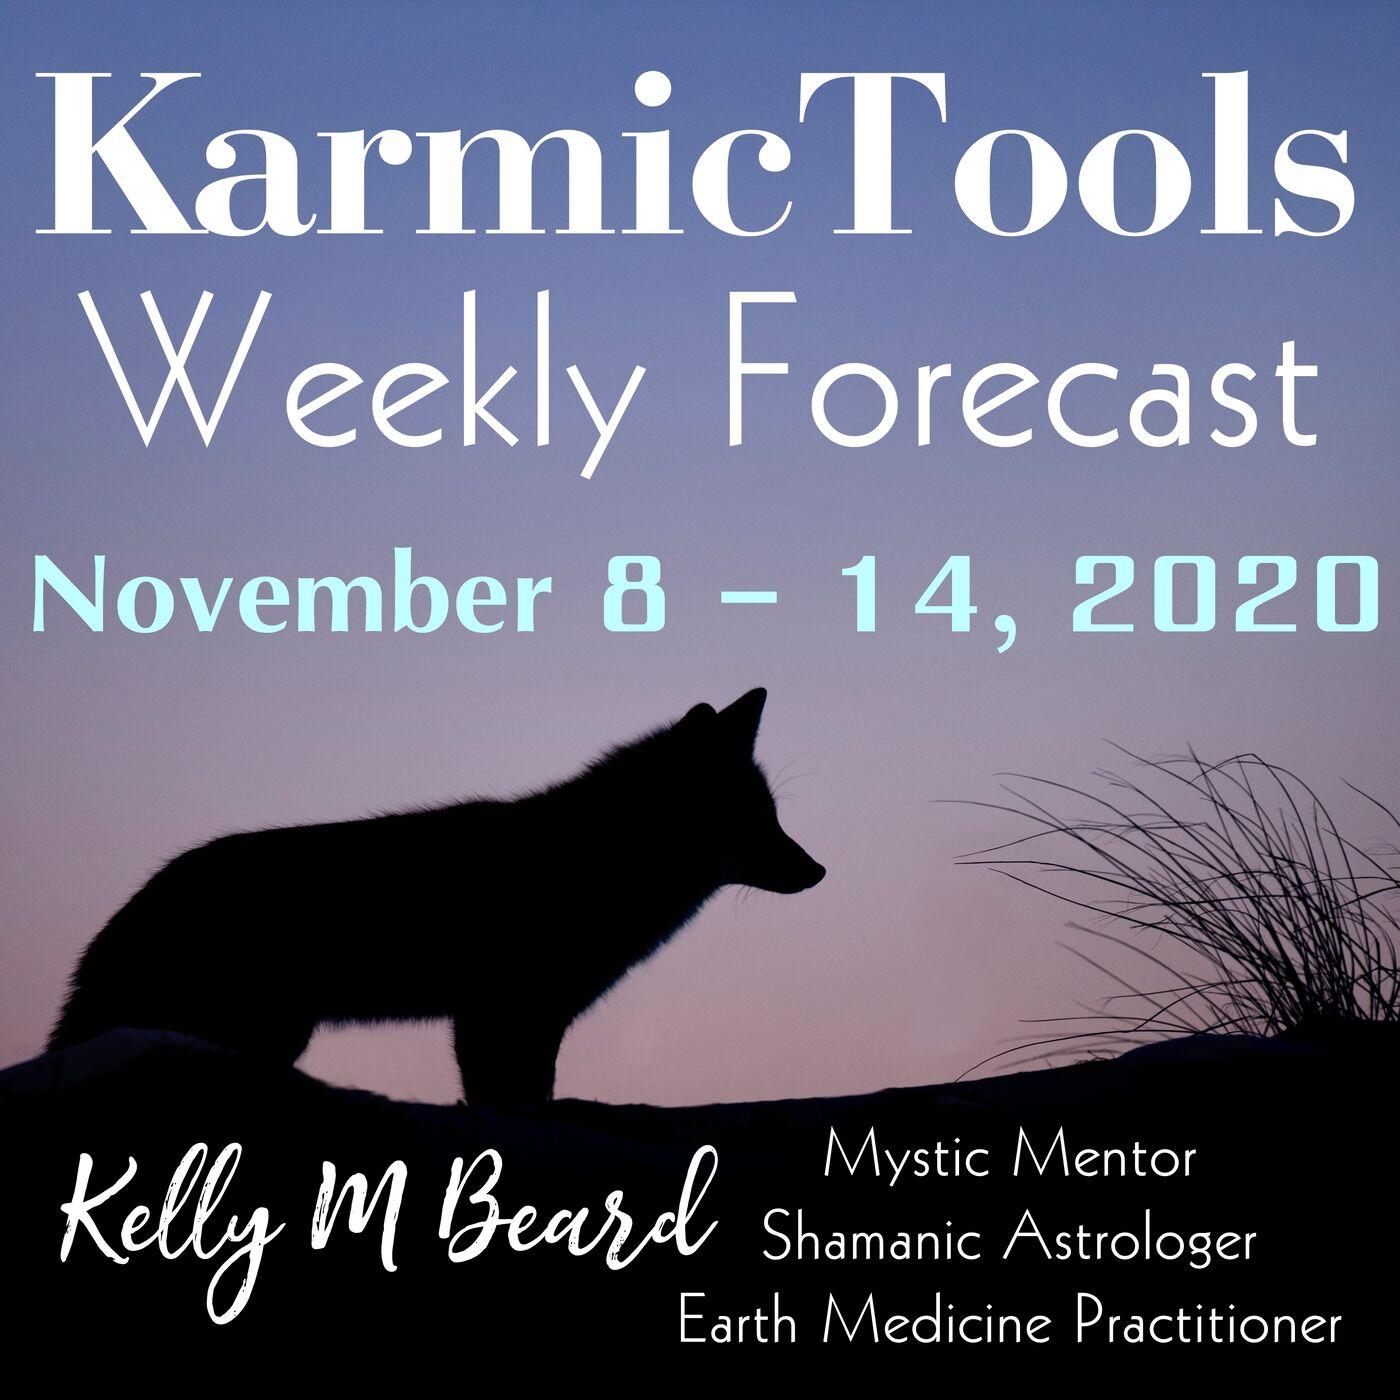 Nov 8 - 14, 2020 KarmicTools Weekly Forecast